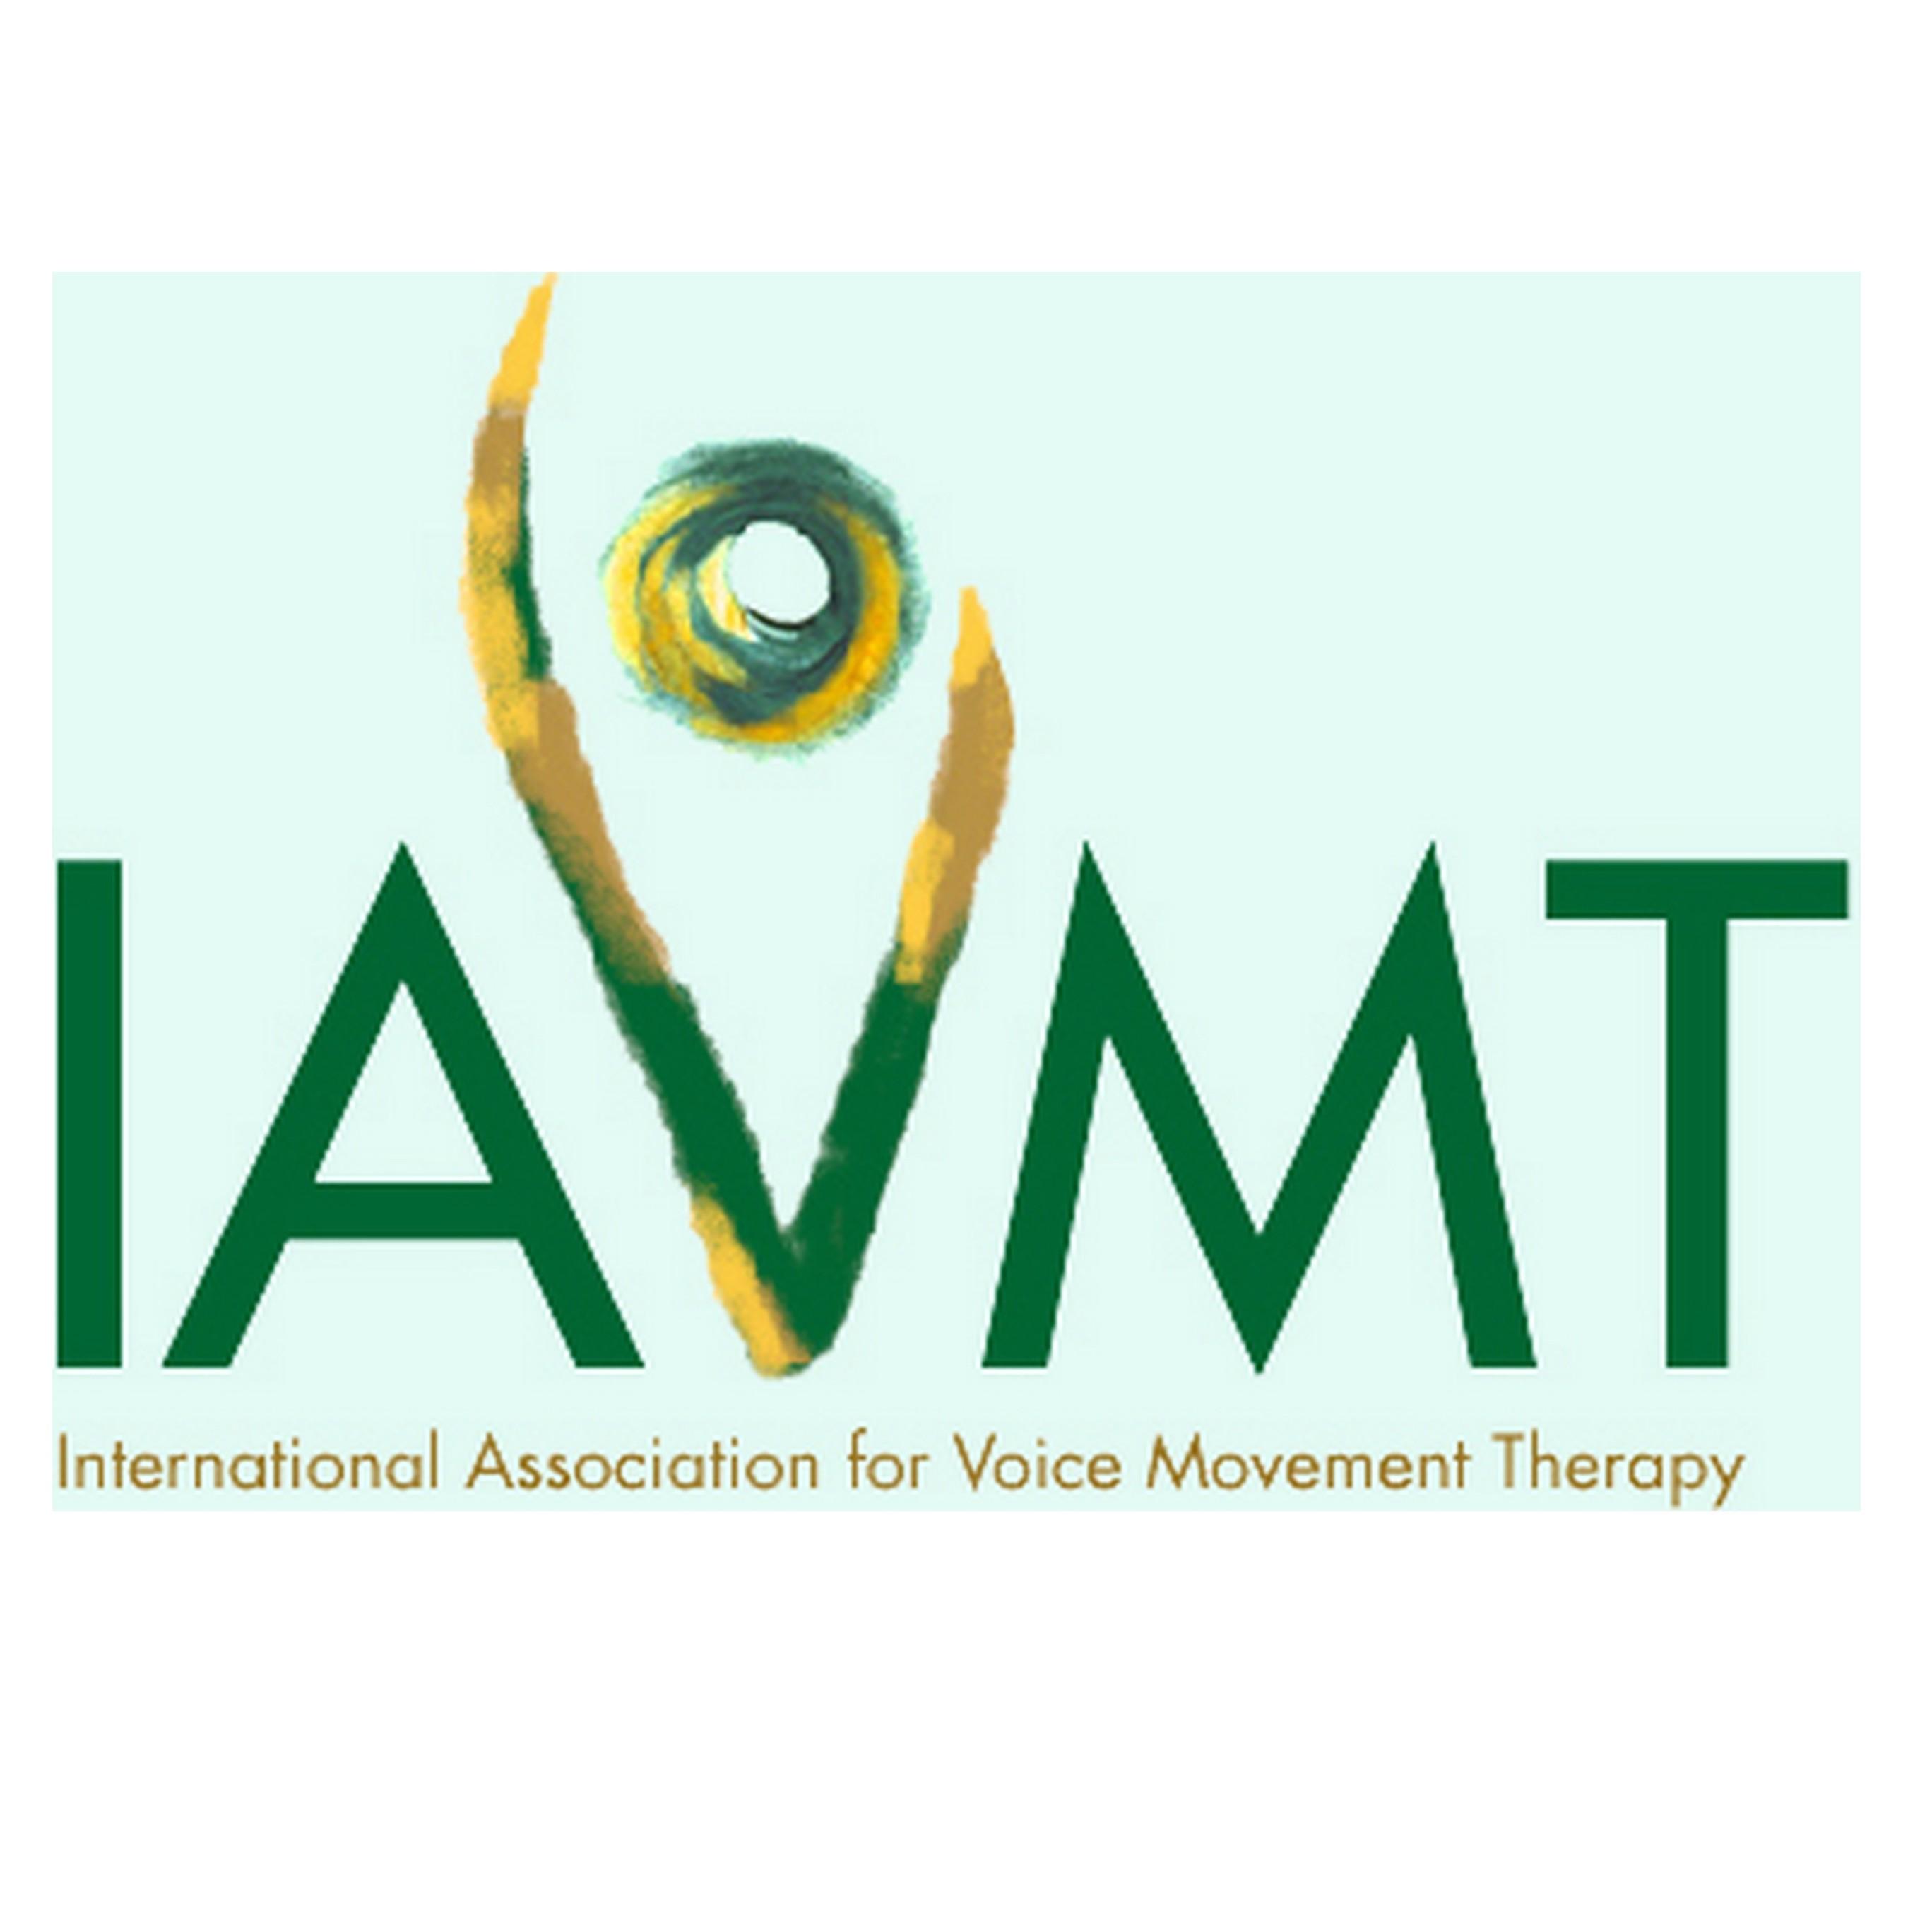 IAVMT Blog